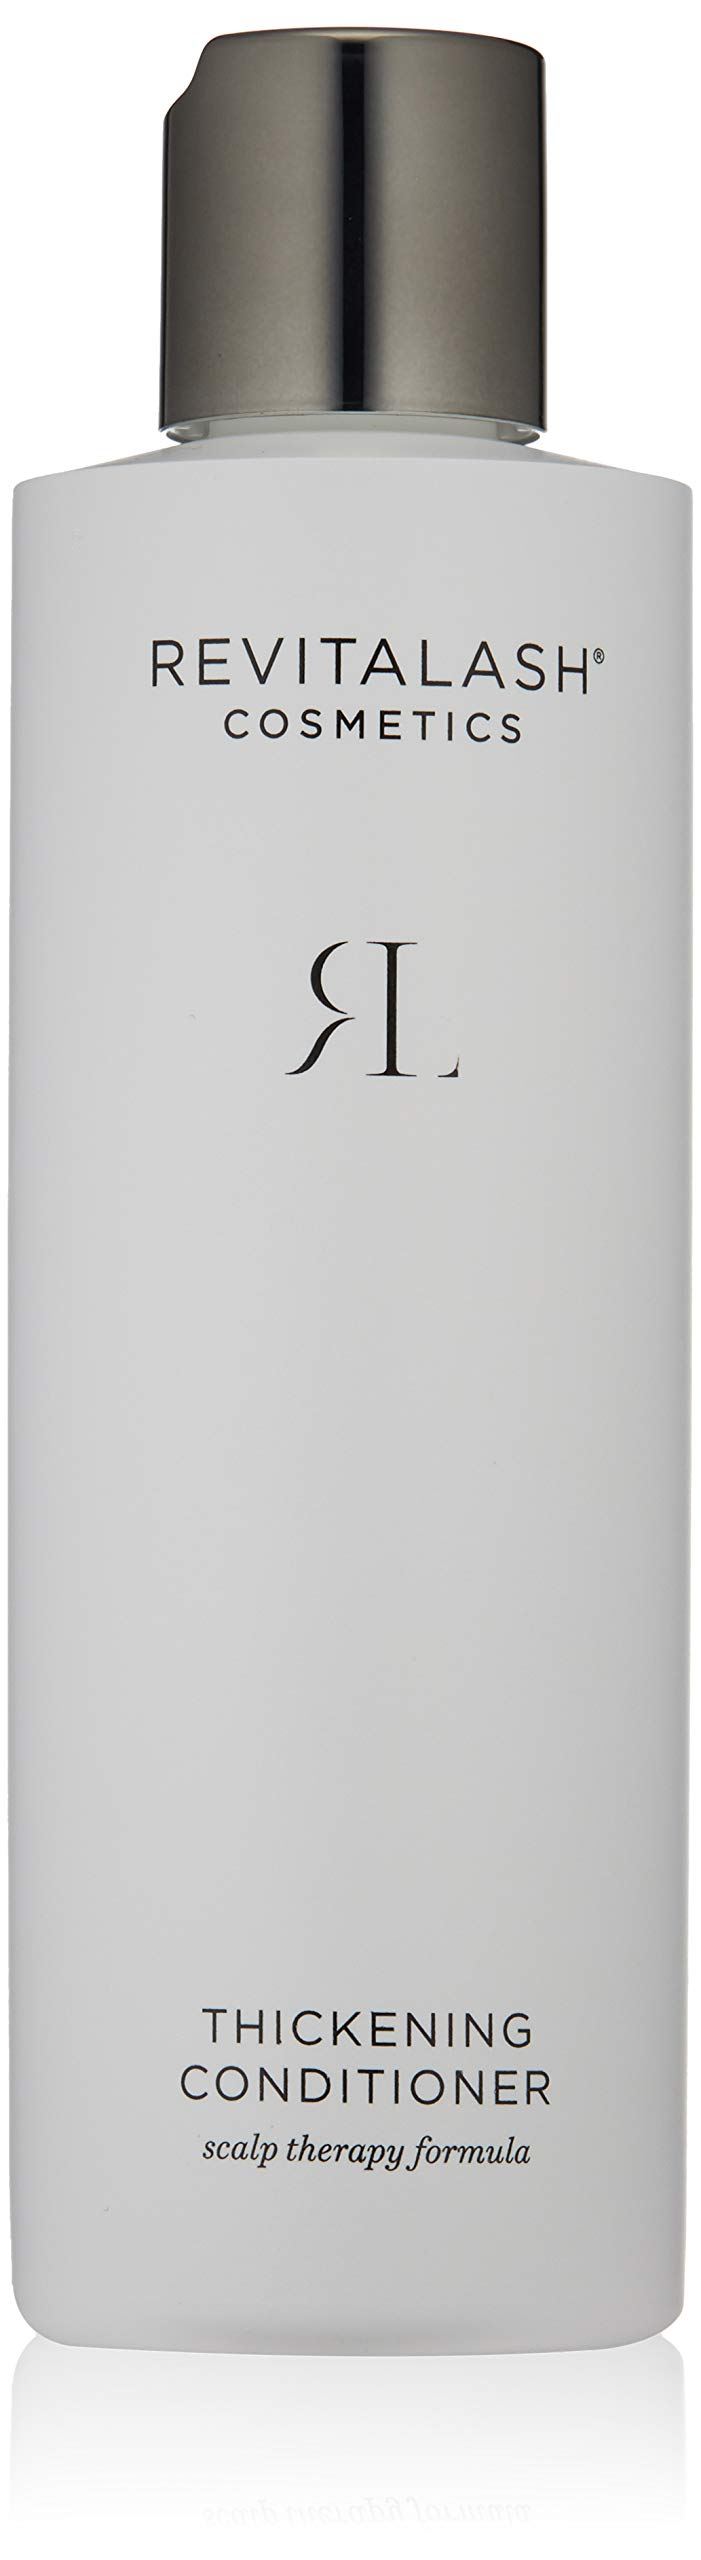 RevitaLash Cosmetics, Thickening Conditioner - Scalp Therapy Formula, Hypoallergenic & Cruelty Free